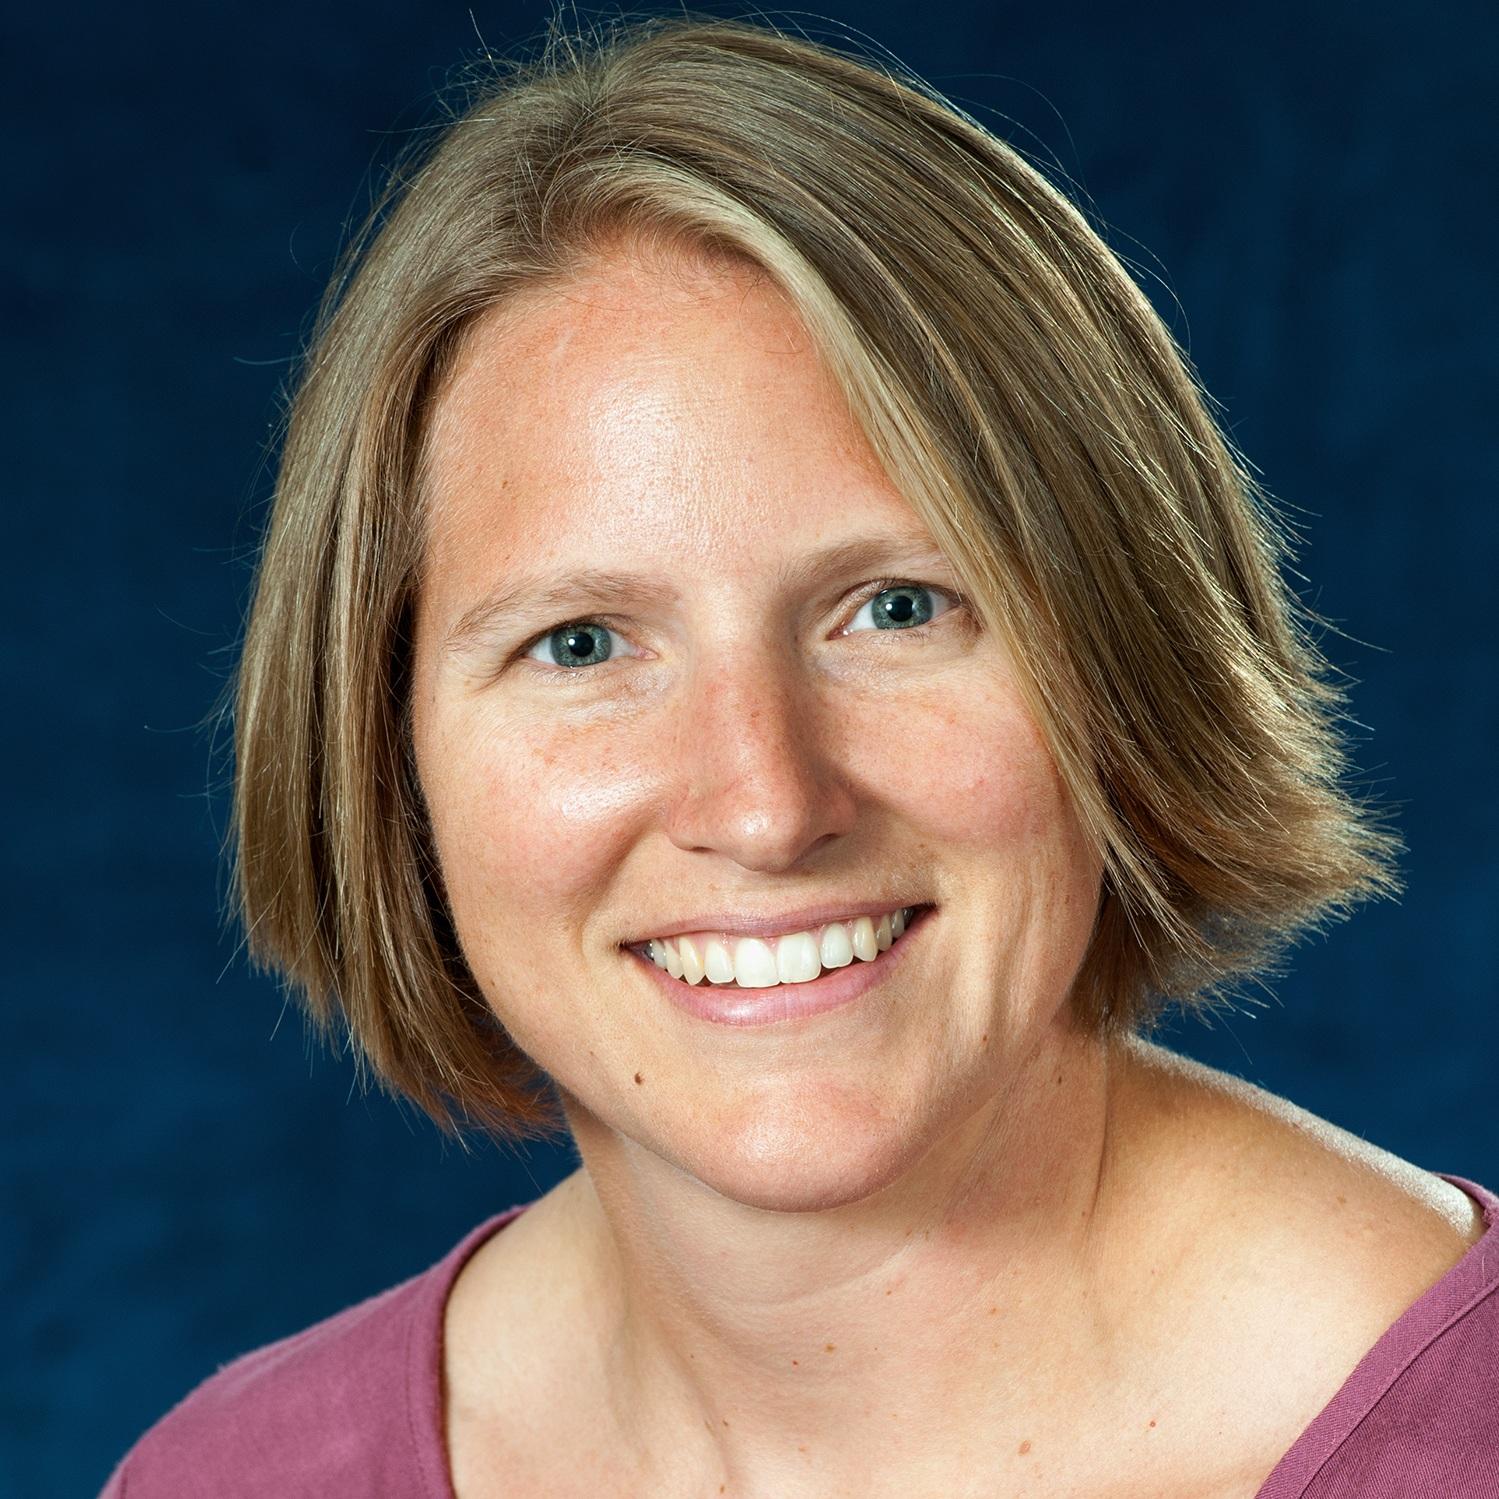 Erin Epperly, DVM, DACVR - Assistant Clinical Professor, Diagnostic Imaging, Cornell University College of Veterinary Medicine